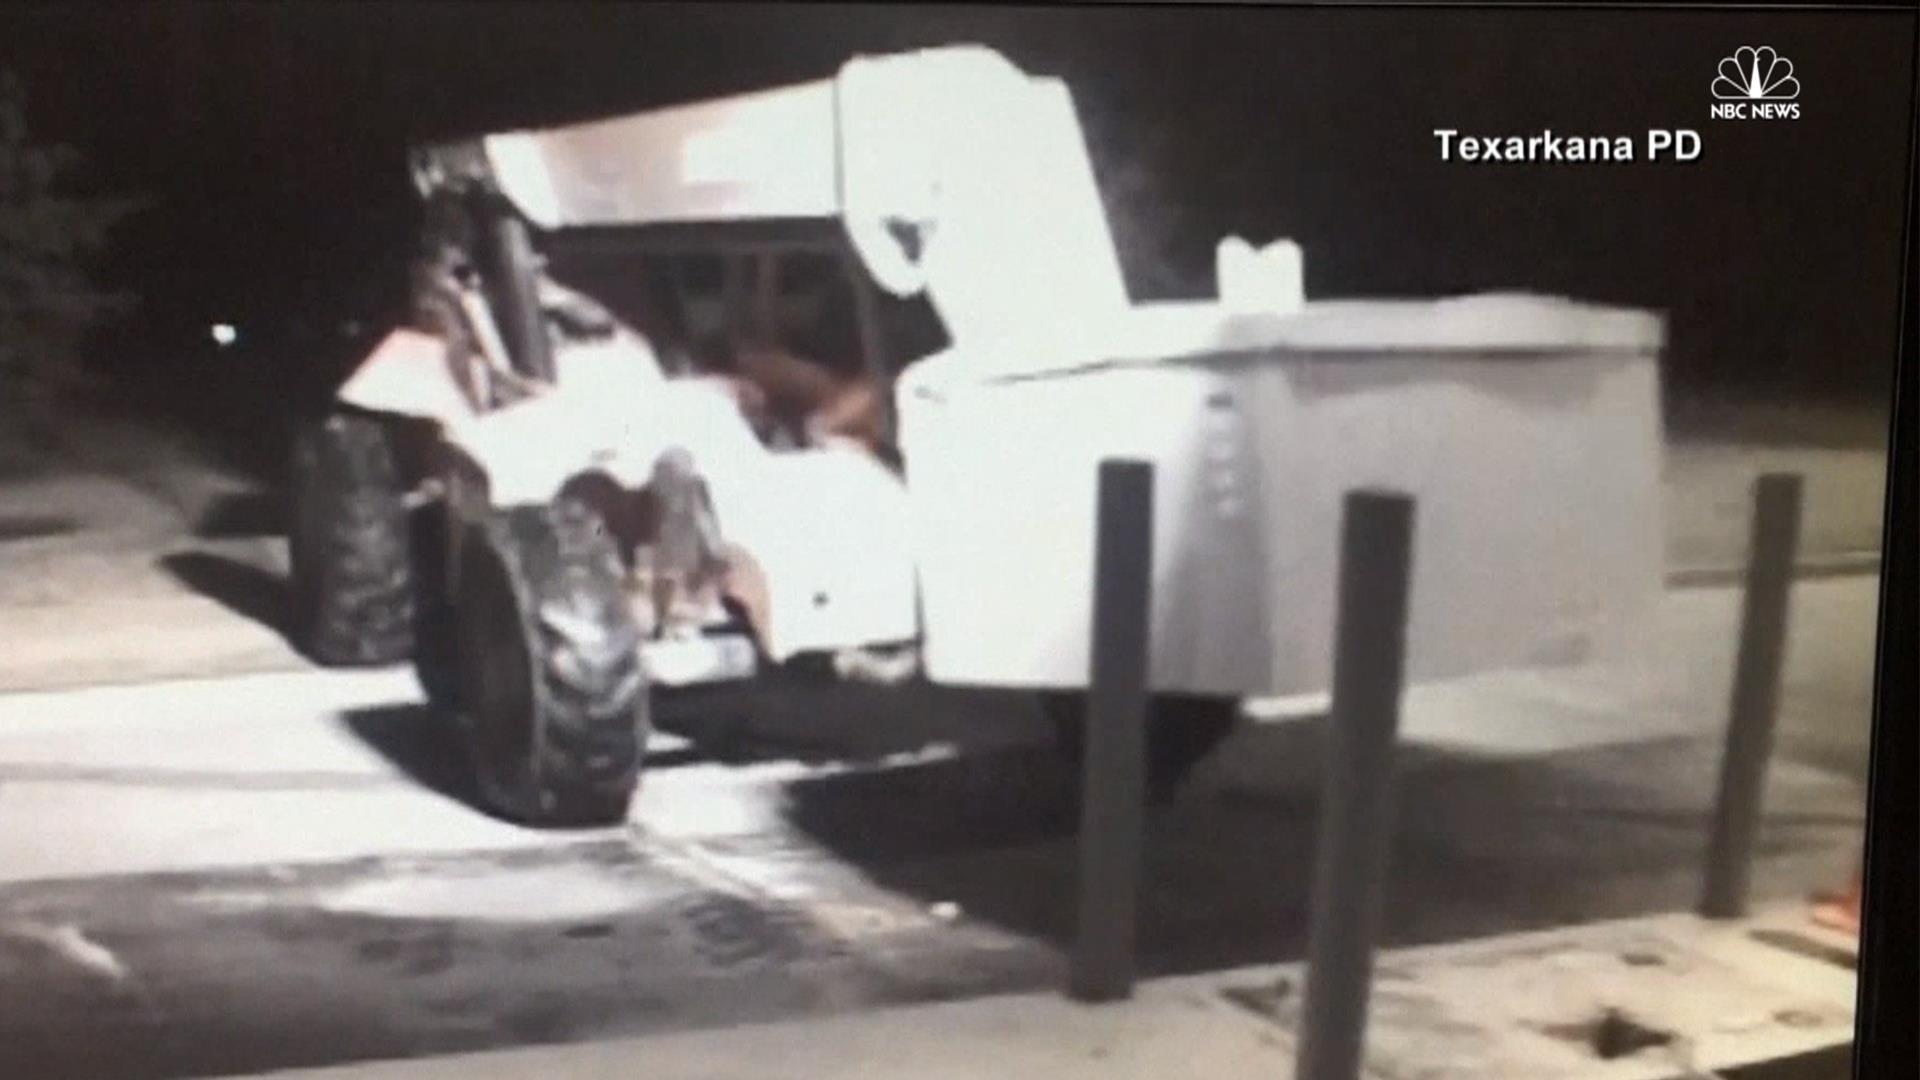 Atm Theft Caught On Camera Nbc News